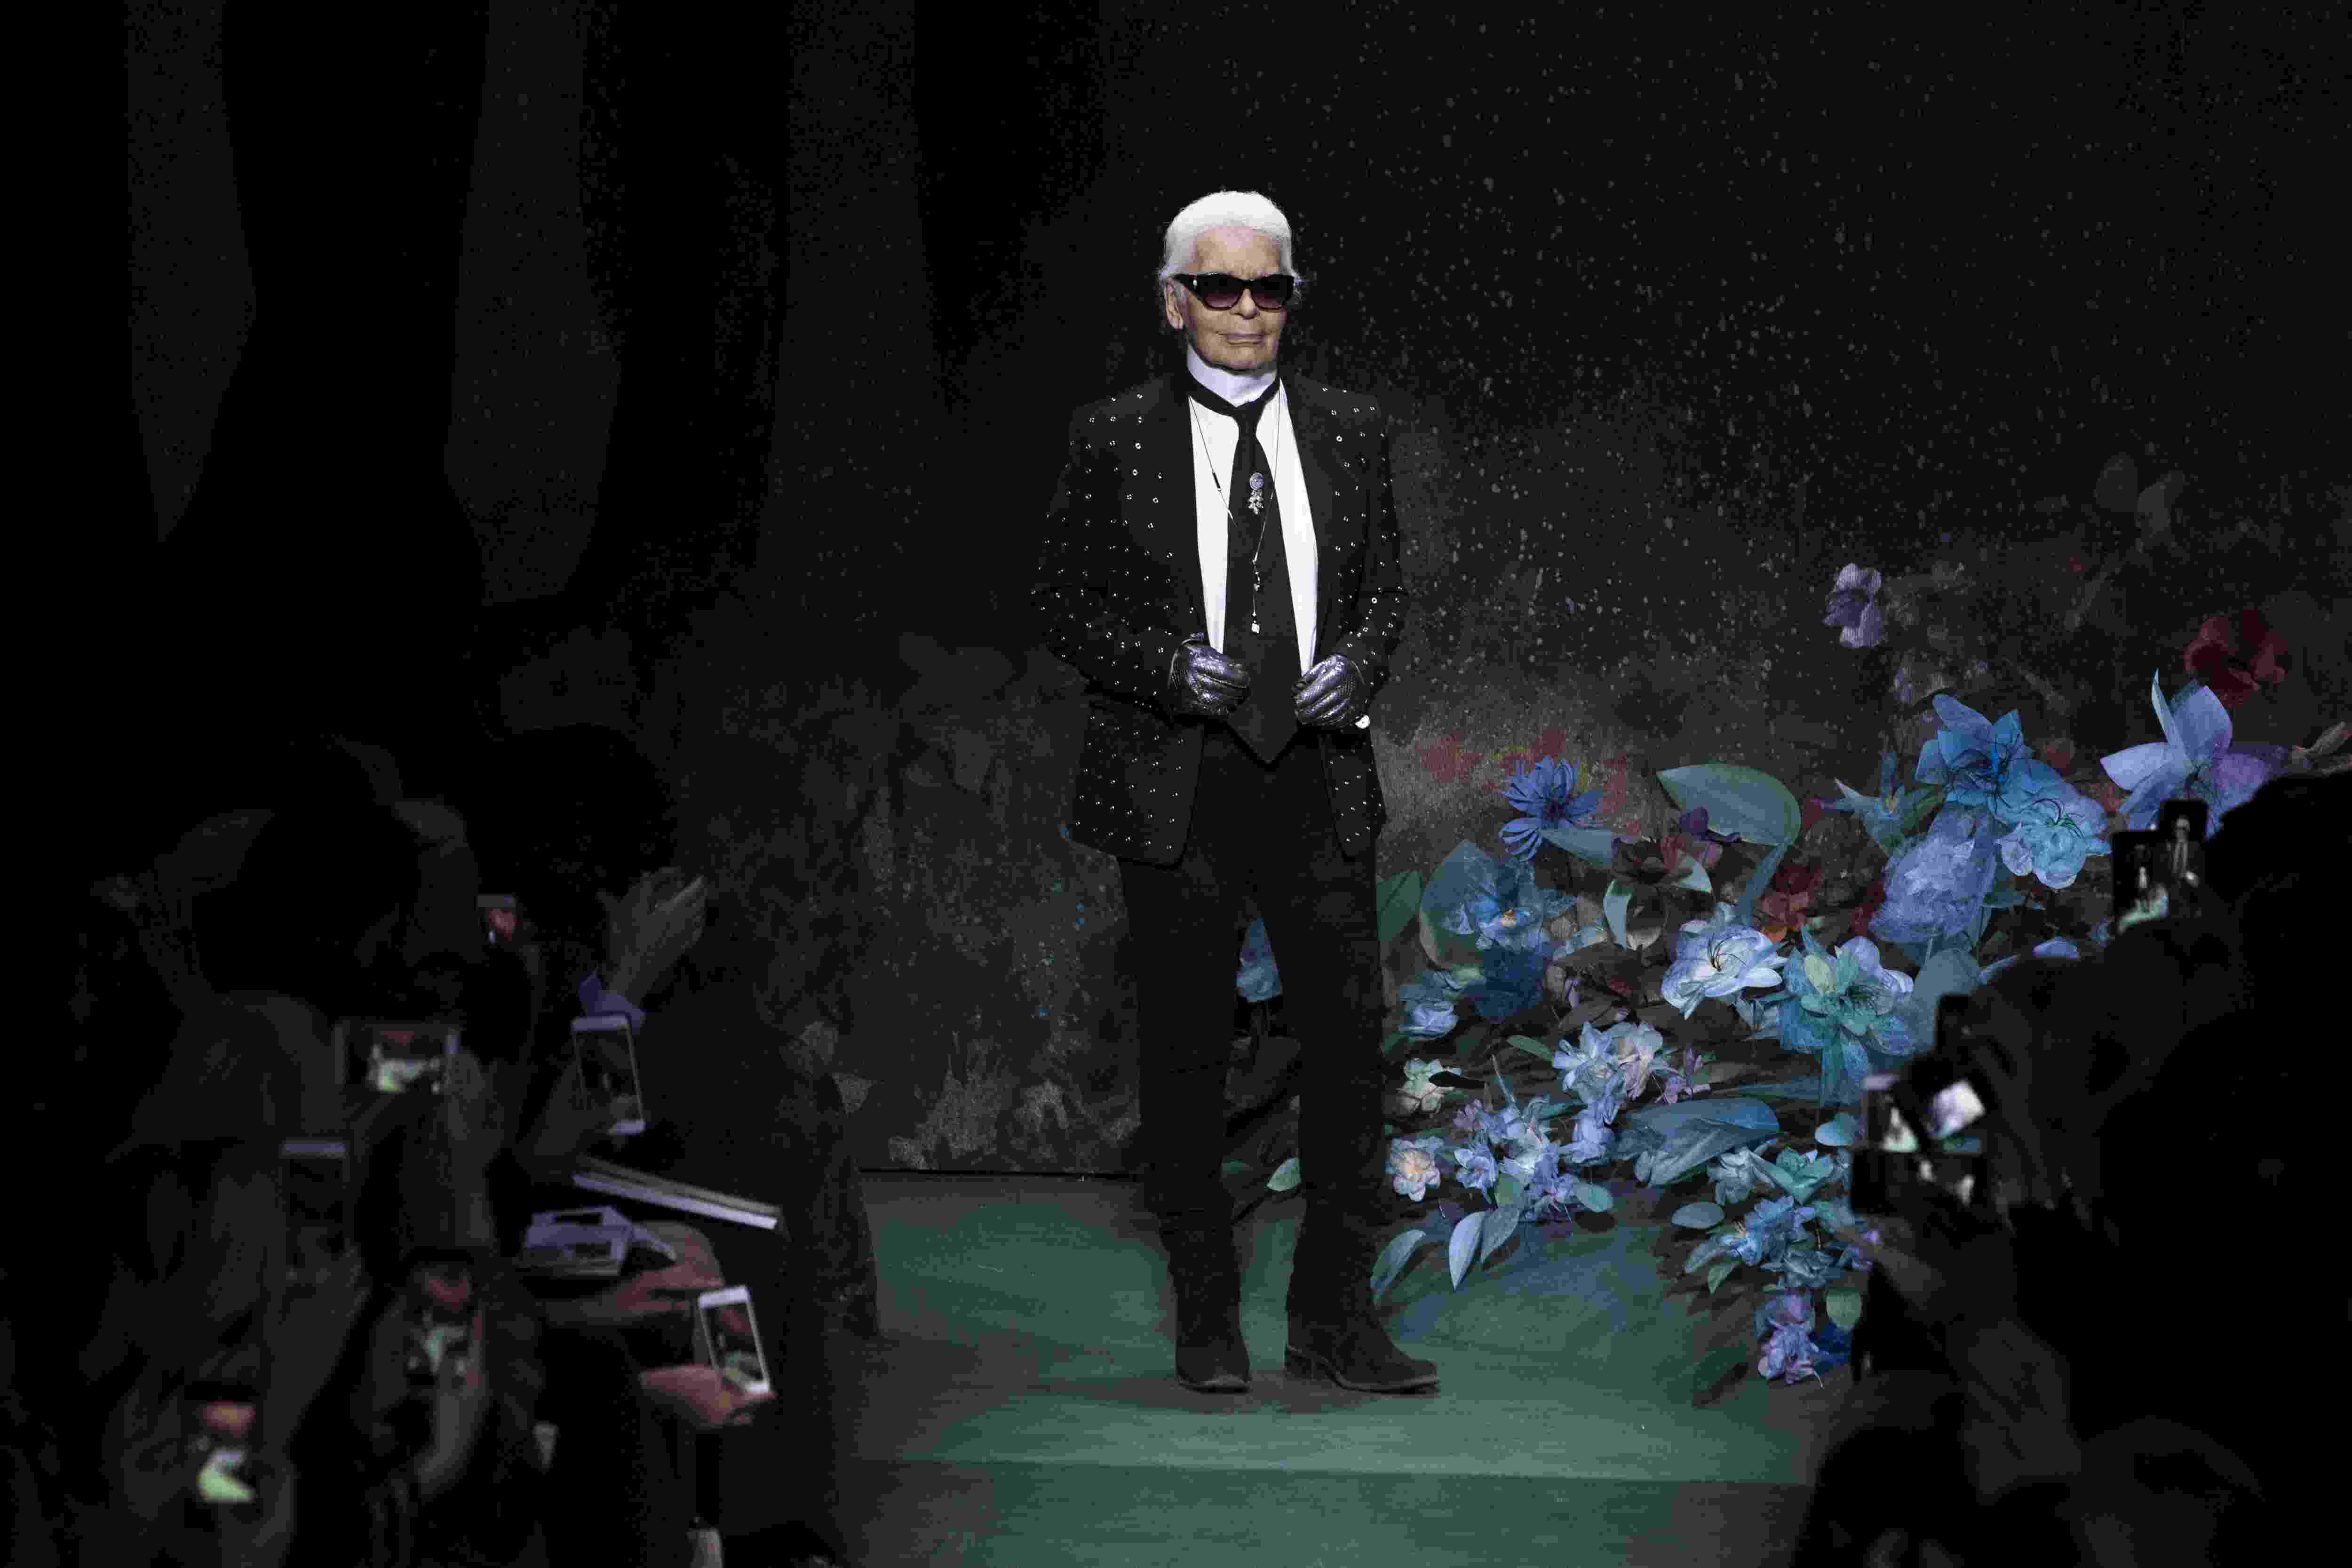 Пішов з життя легендарний модельєр Карл Лагерфельд